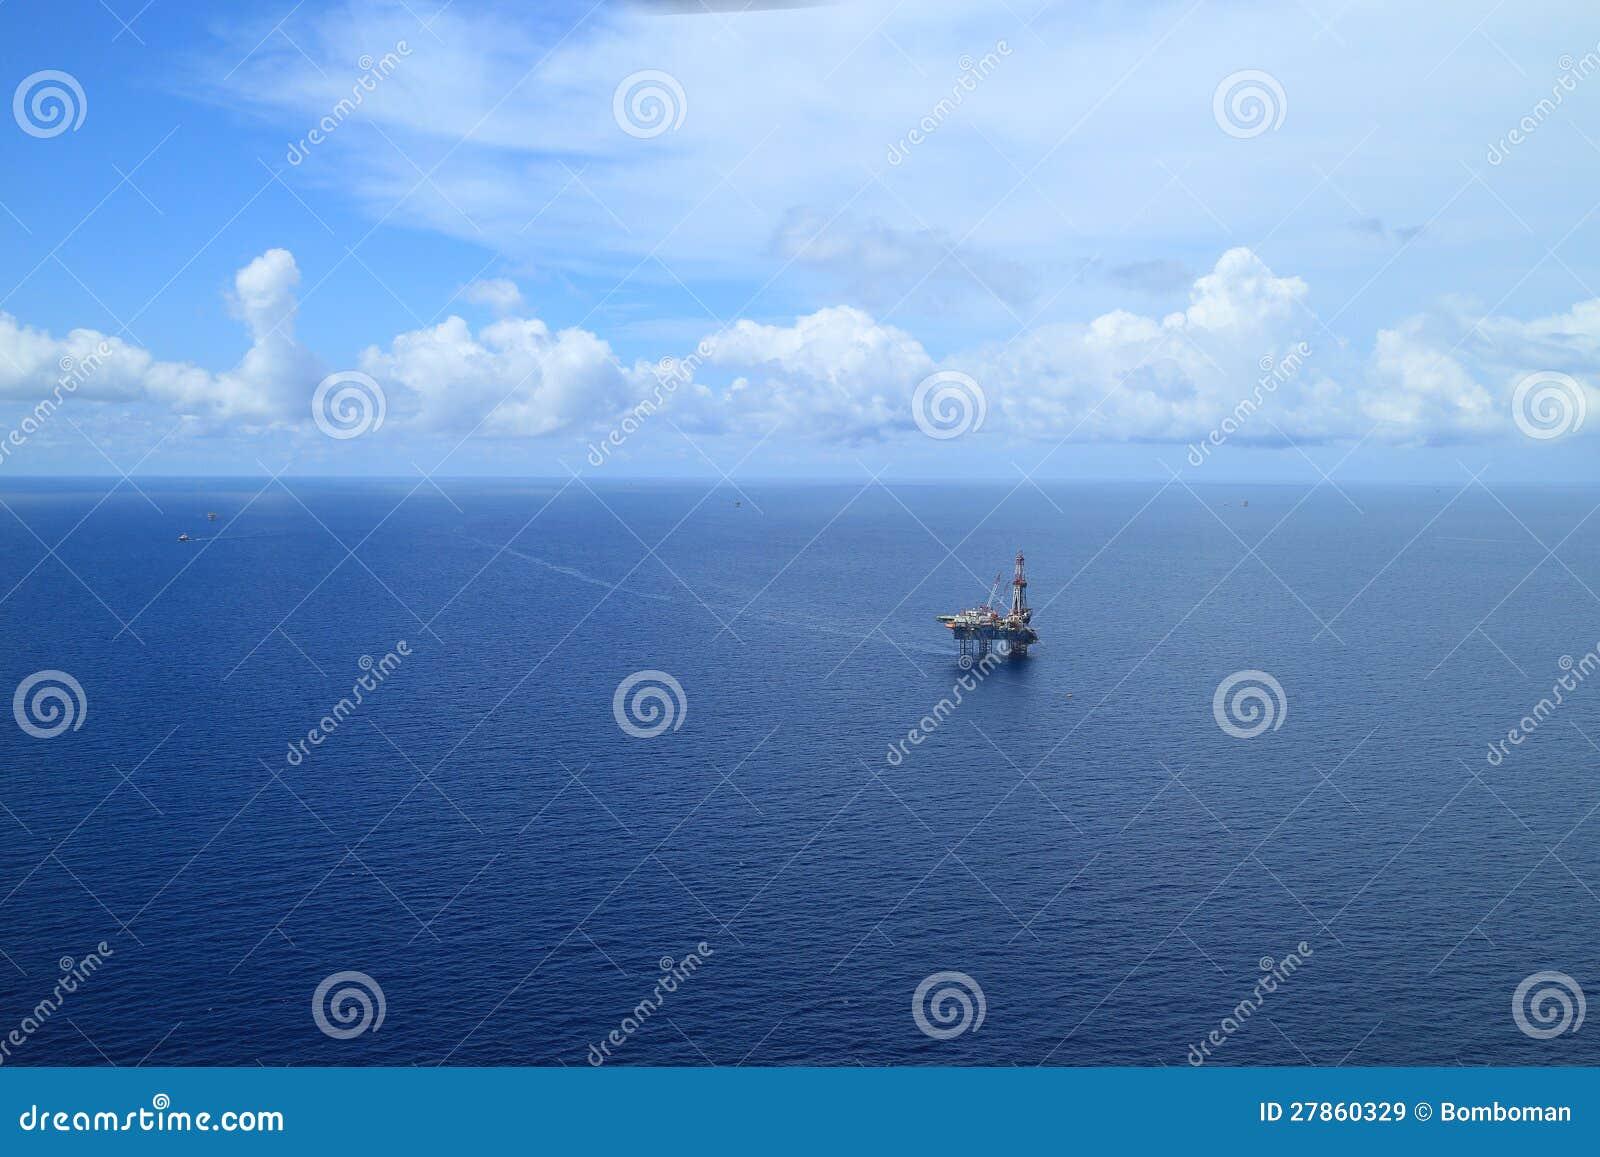 Widok Z Lotu Ptaka Na morzu Jack Na morzu TARGET612_1_ Takielunek